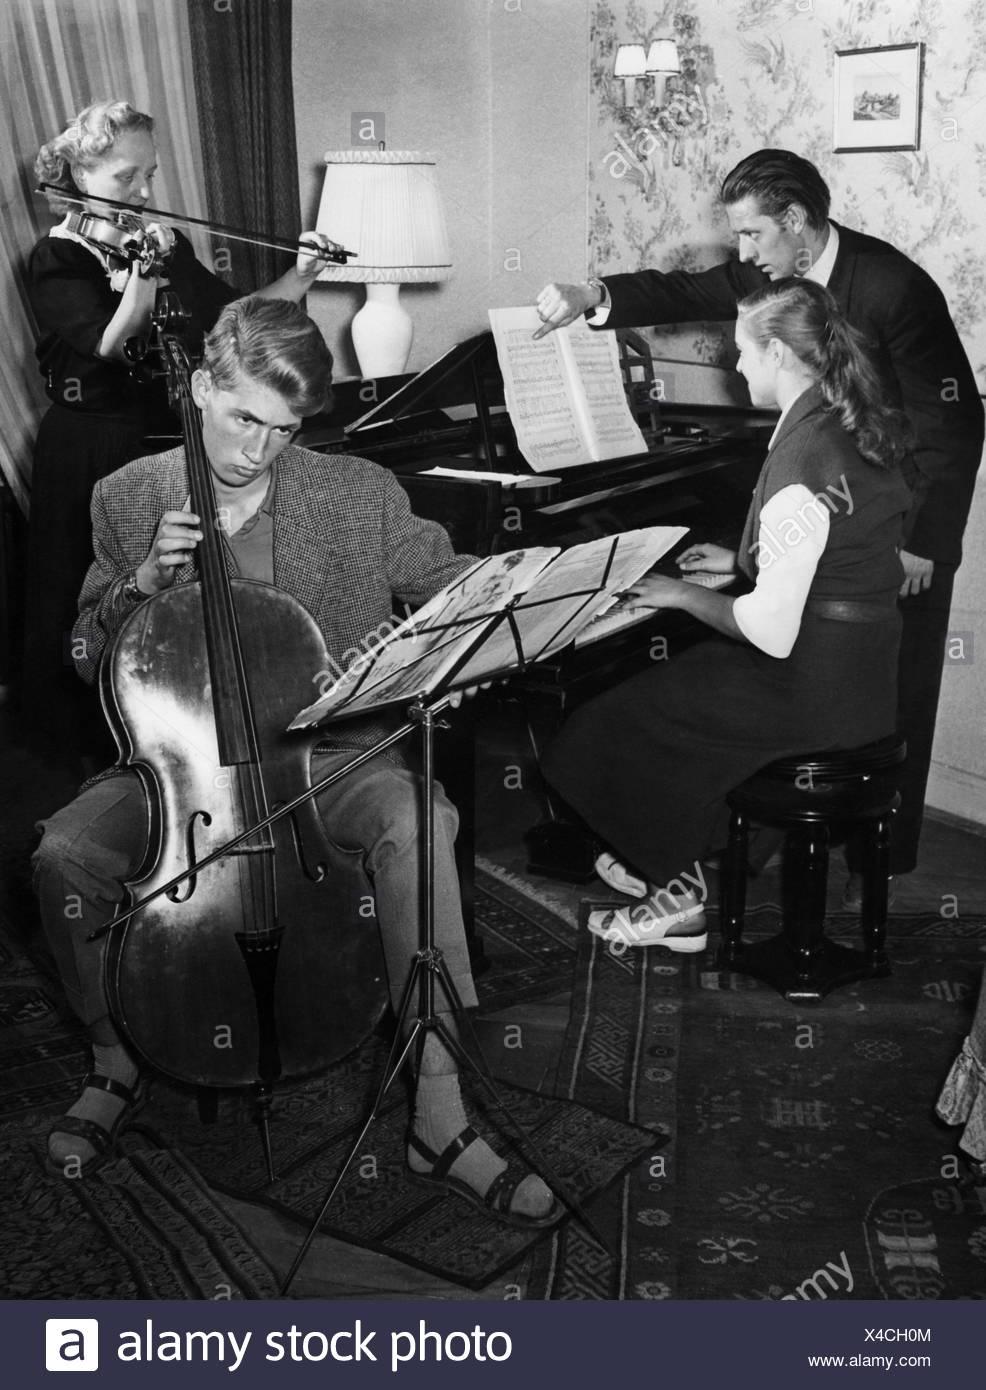 music, salon music, German family making music, 50s, Germany, piano